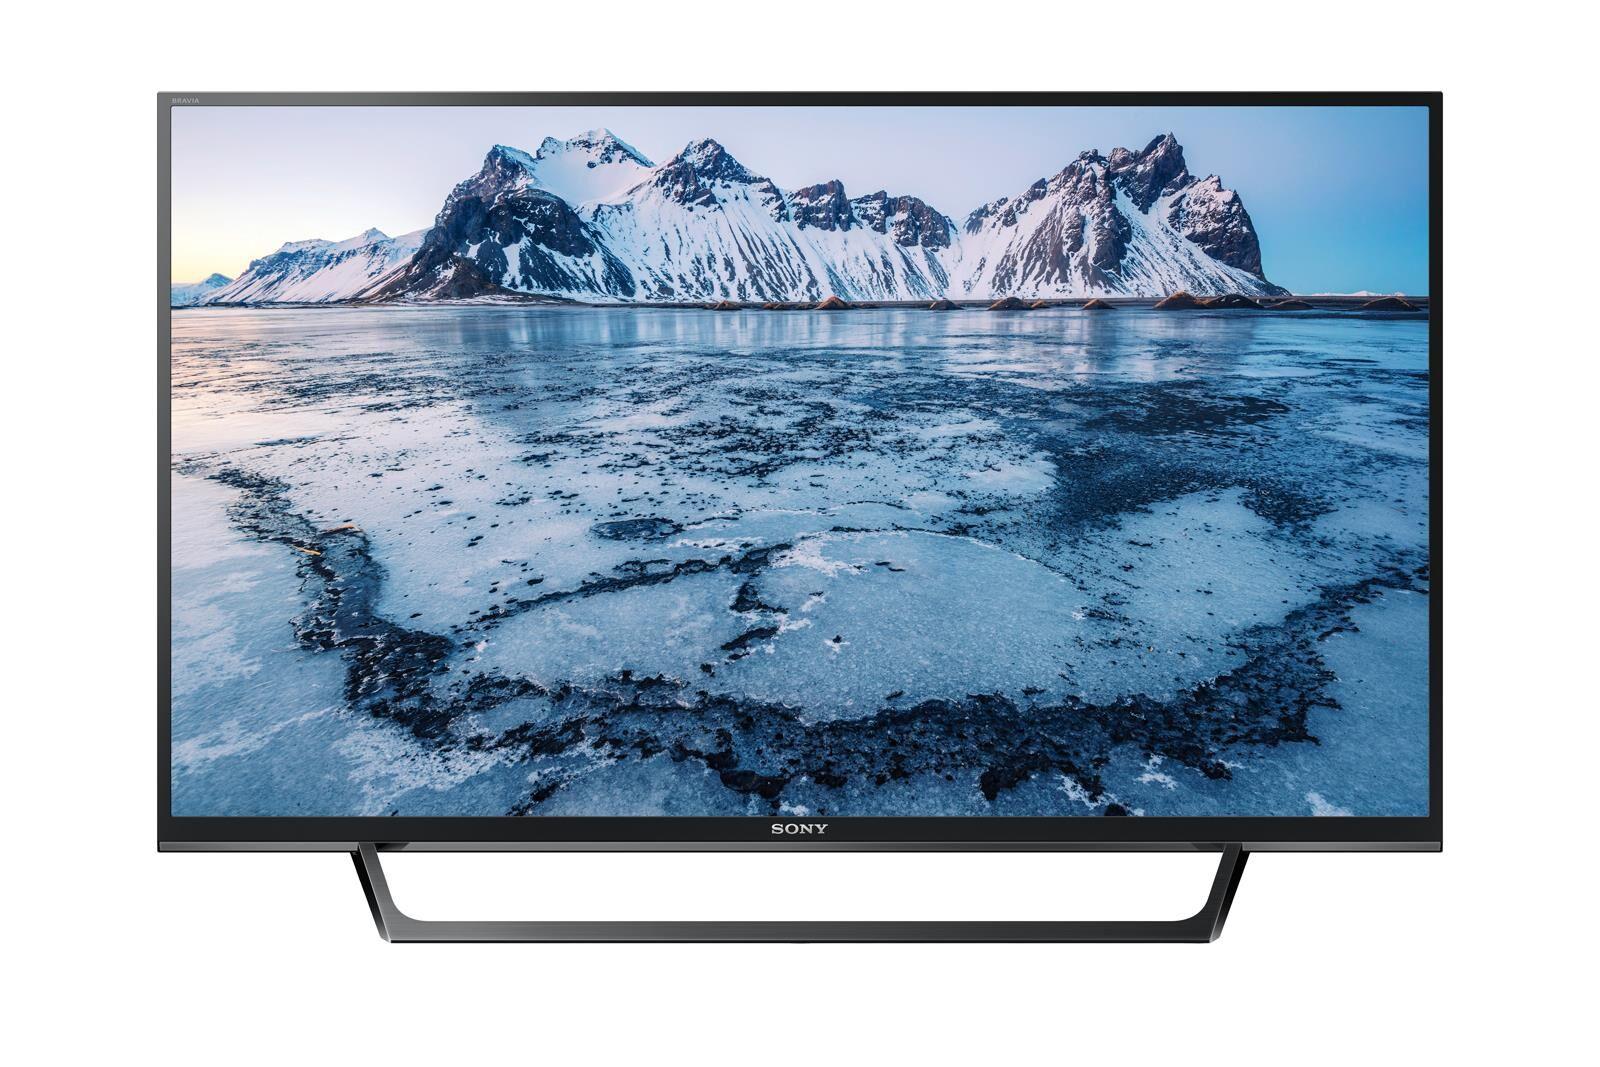 Sony KDL49WE665 Tv Led 49'' Edge Led Full Hd Smart con Browser